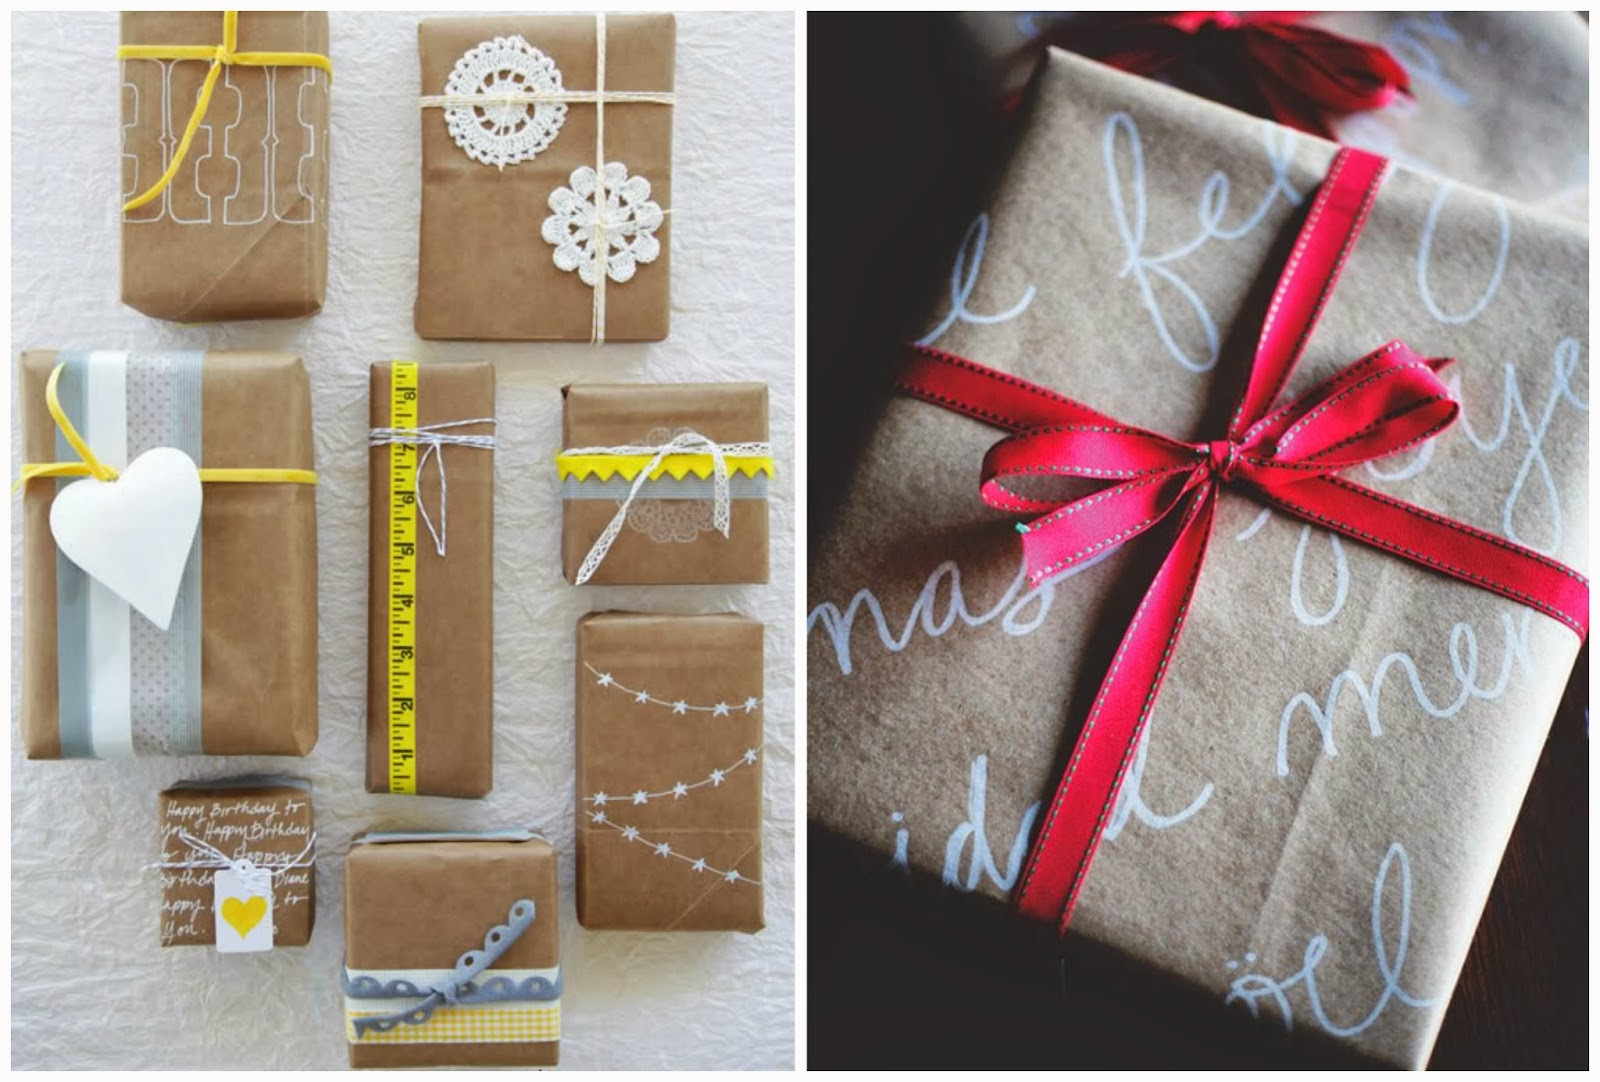 natal-presente-embalagem-papel-craft-carimbo-coracao-croche